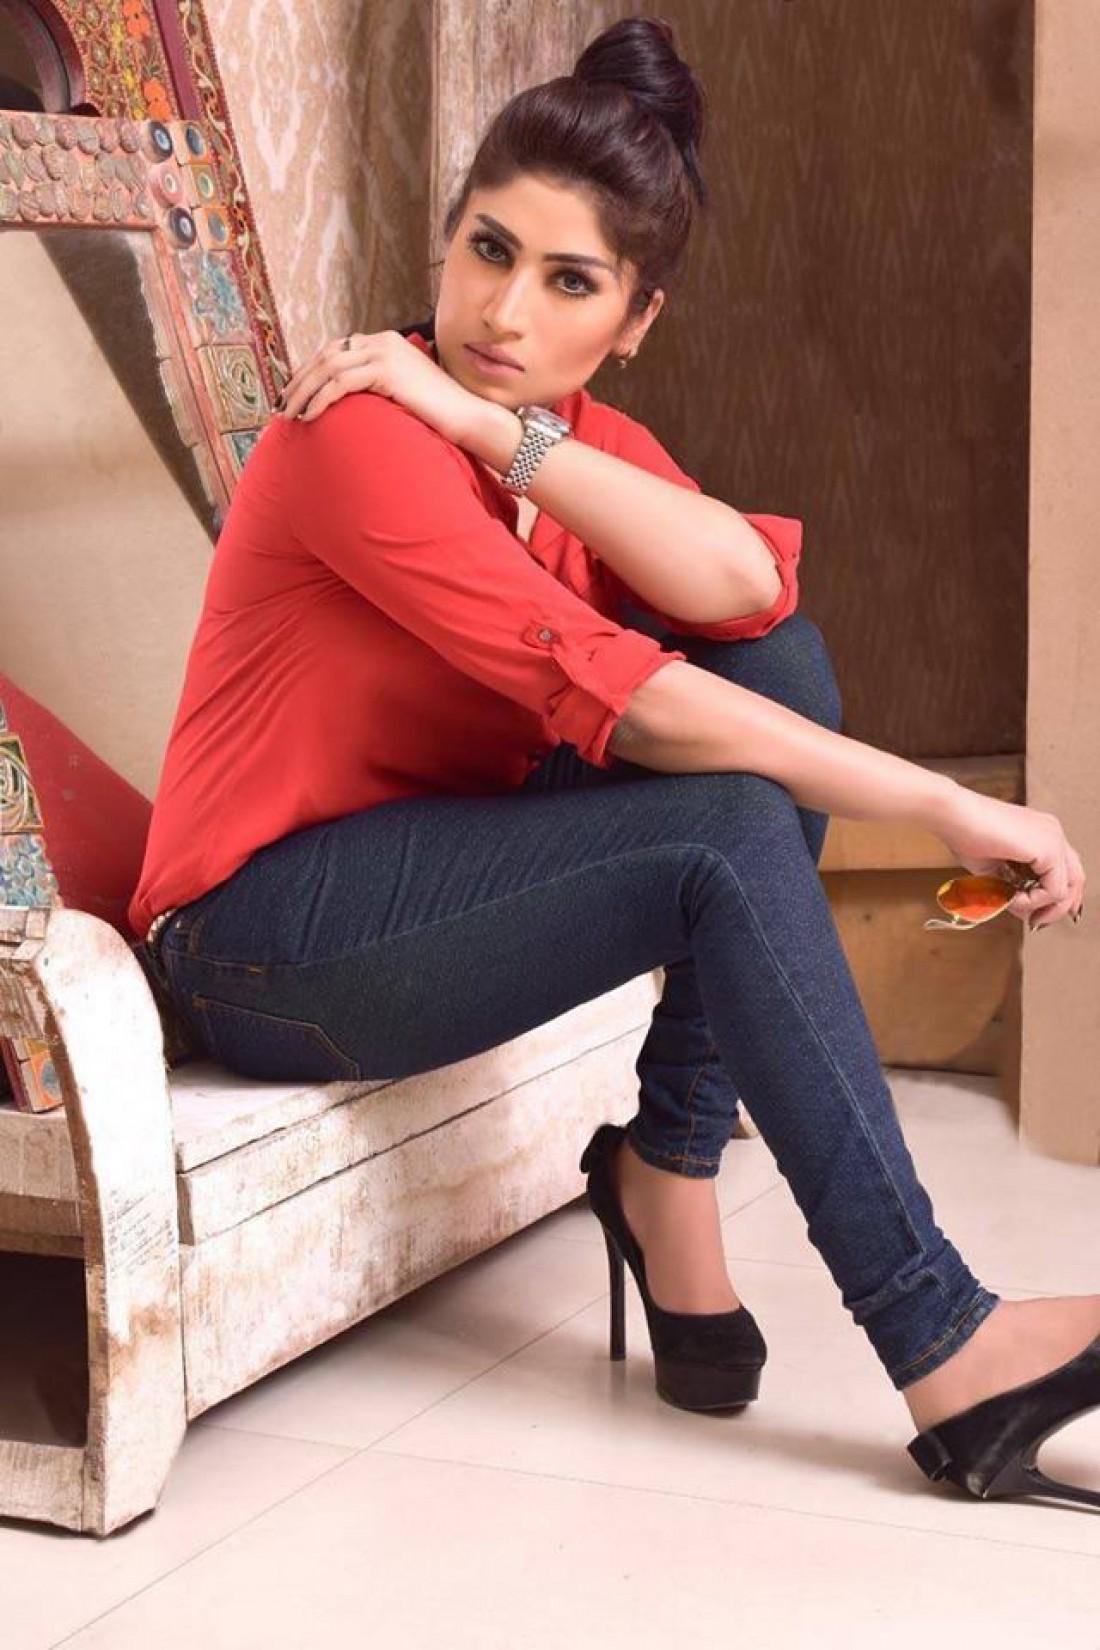 Модель и блогер Кандил Балоч